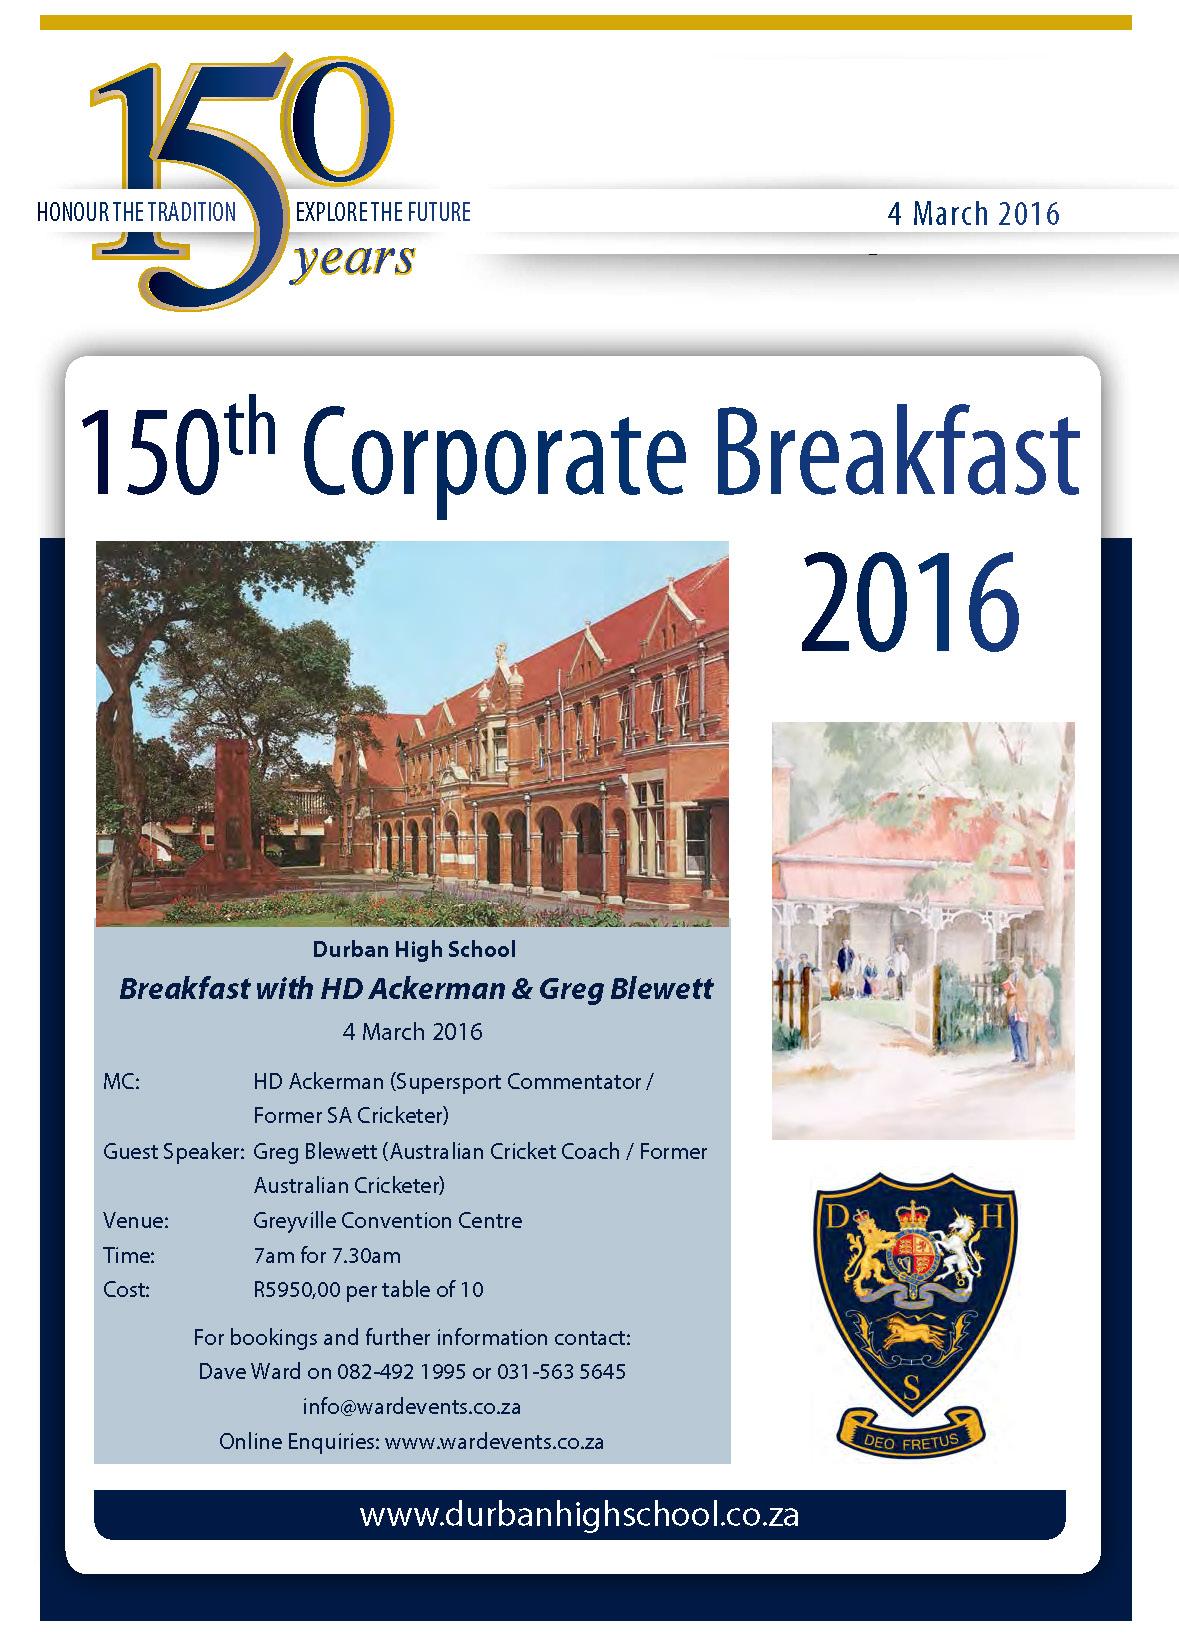 150th Corporate Breakfast